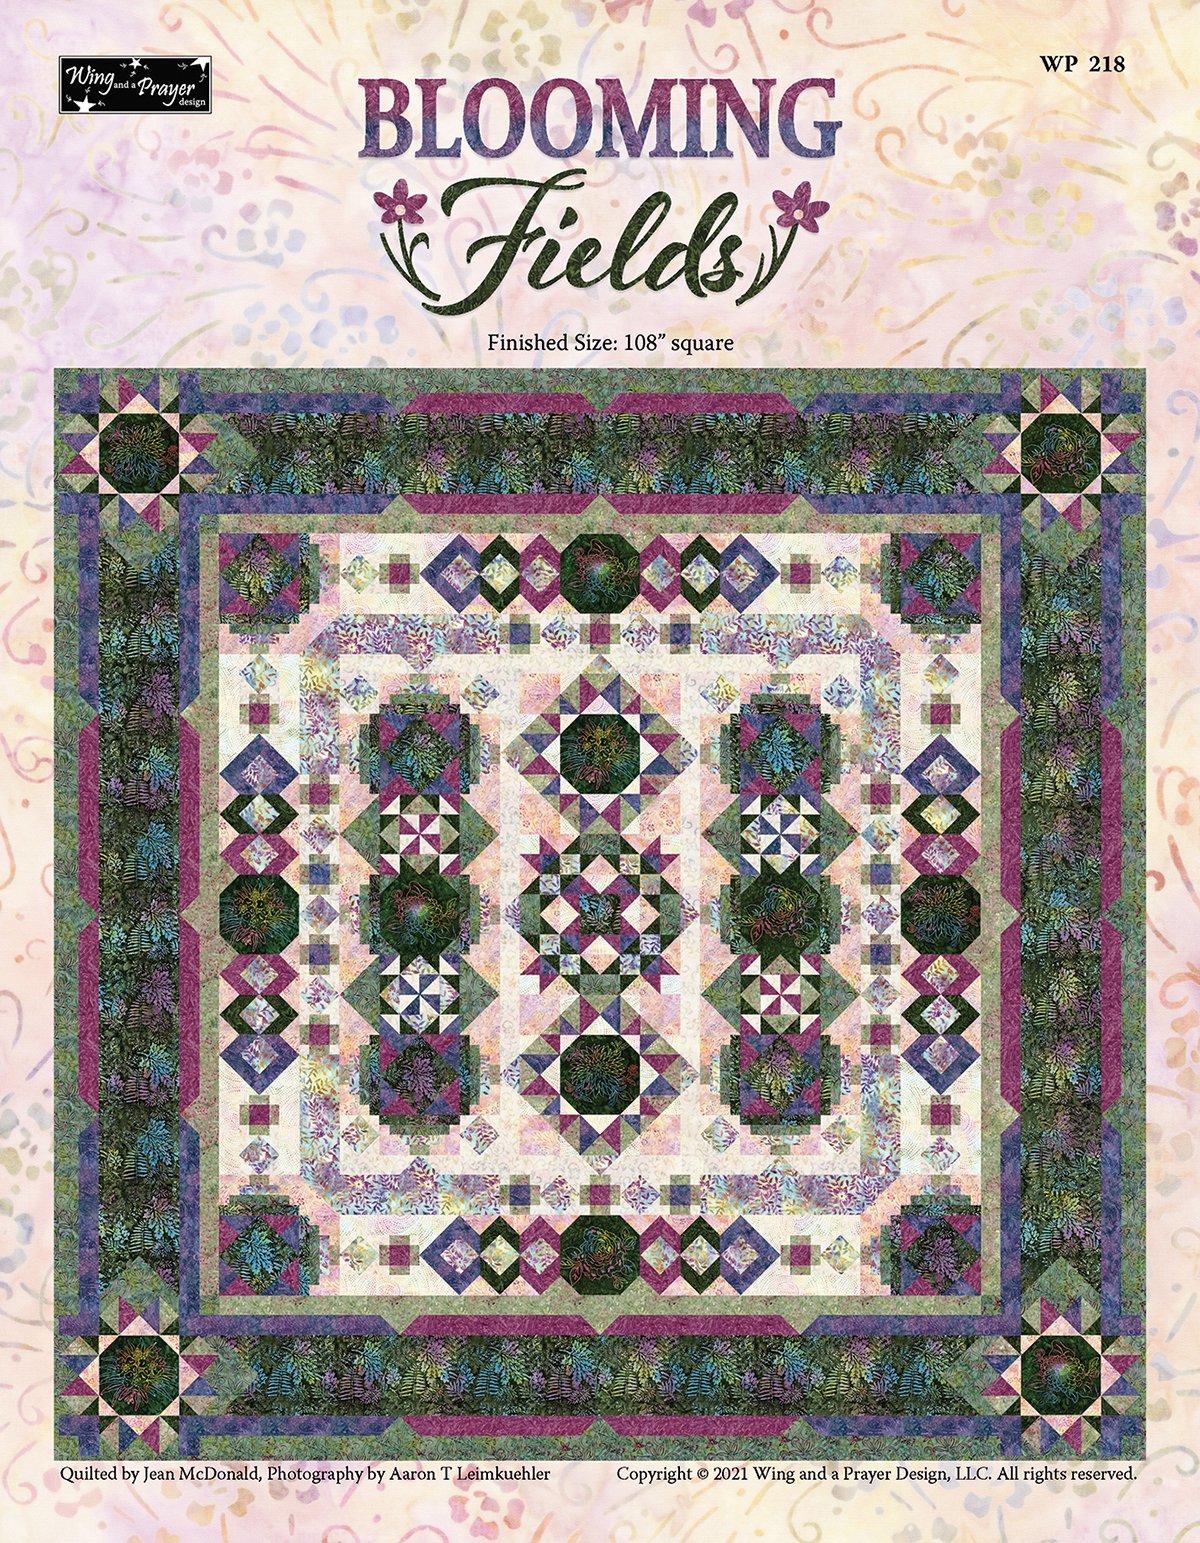 Blooming Fields Quilt Kit Registration